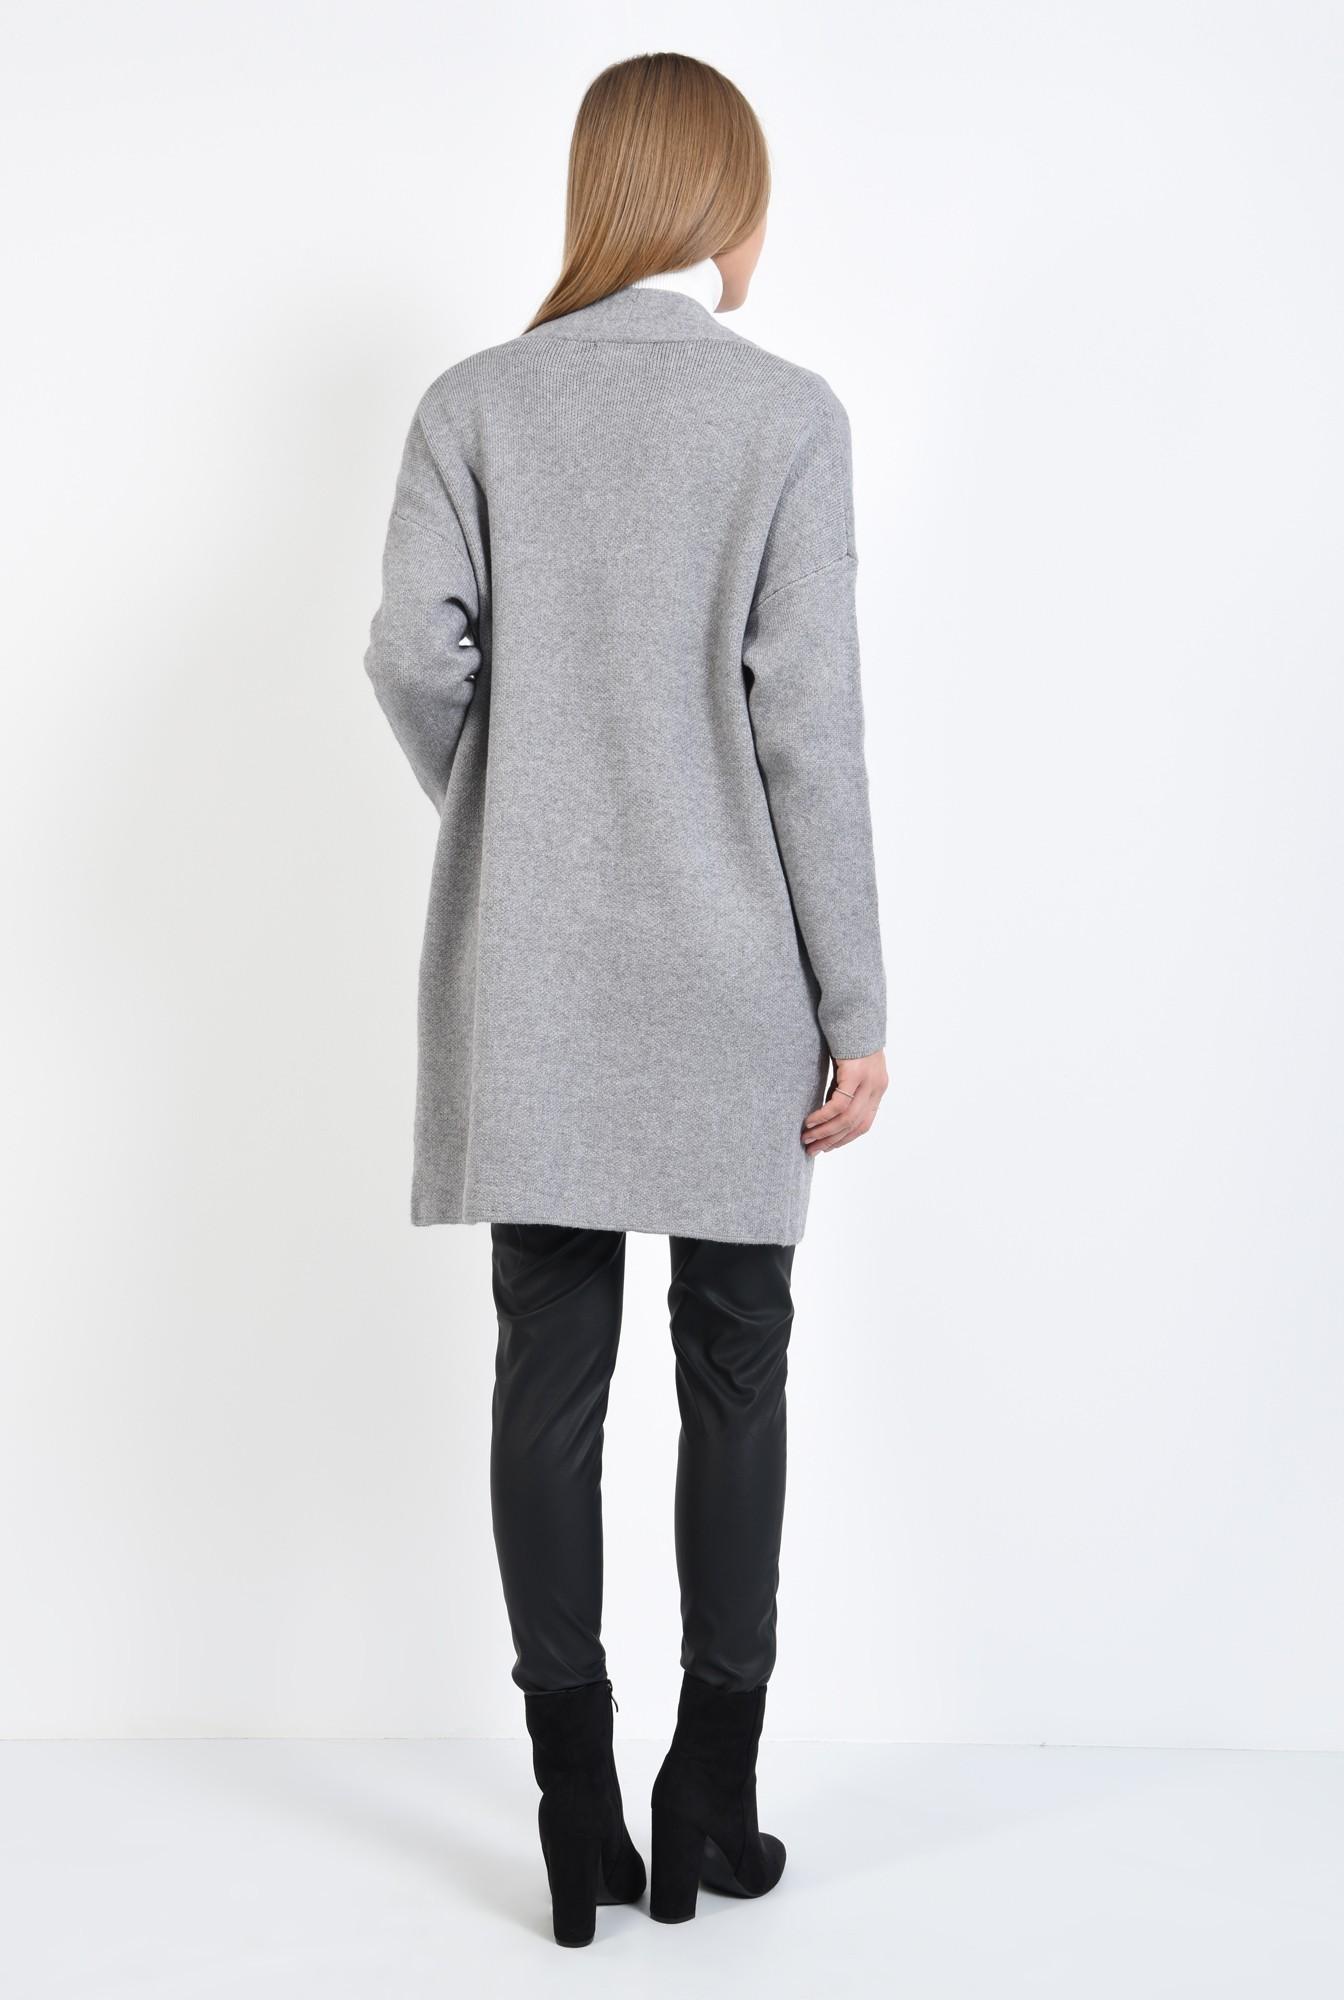 1 - pulover gri, jacheta de toamna, croi drept lejer